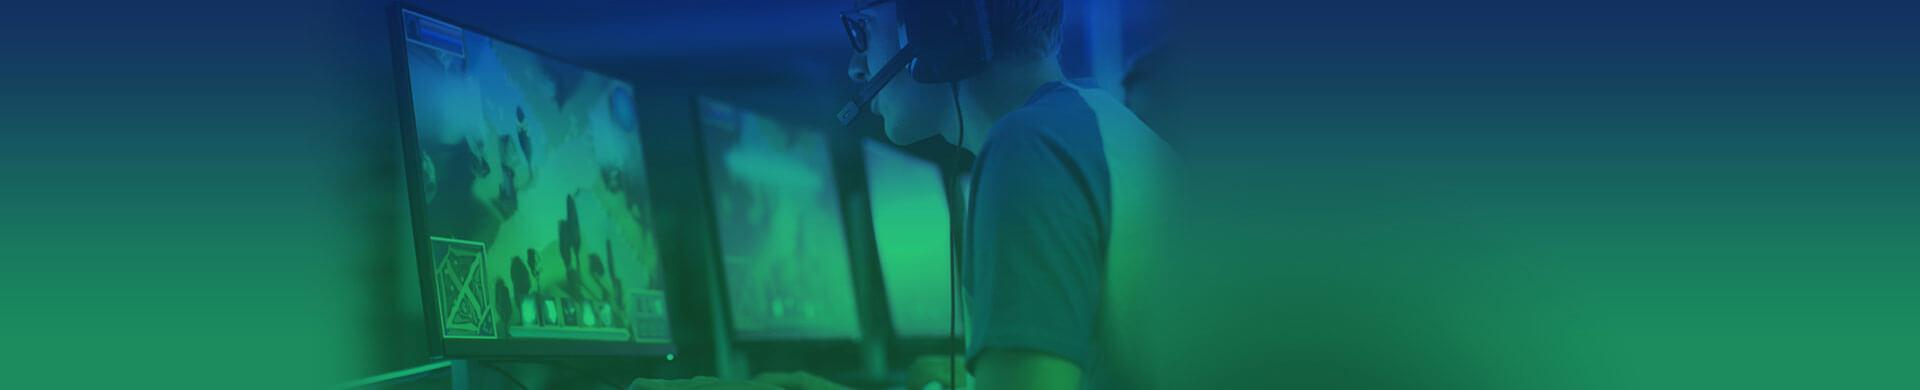 【GCP專門家 x Photon】遊戲業解決方案線上技術研討會 #1